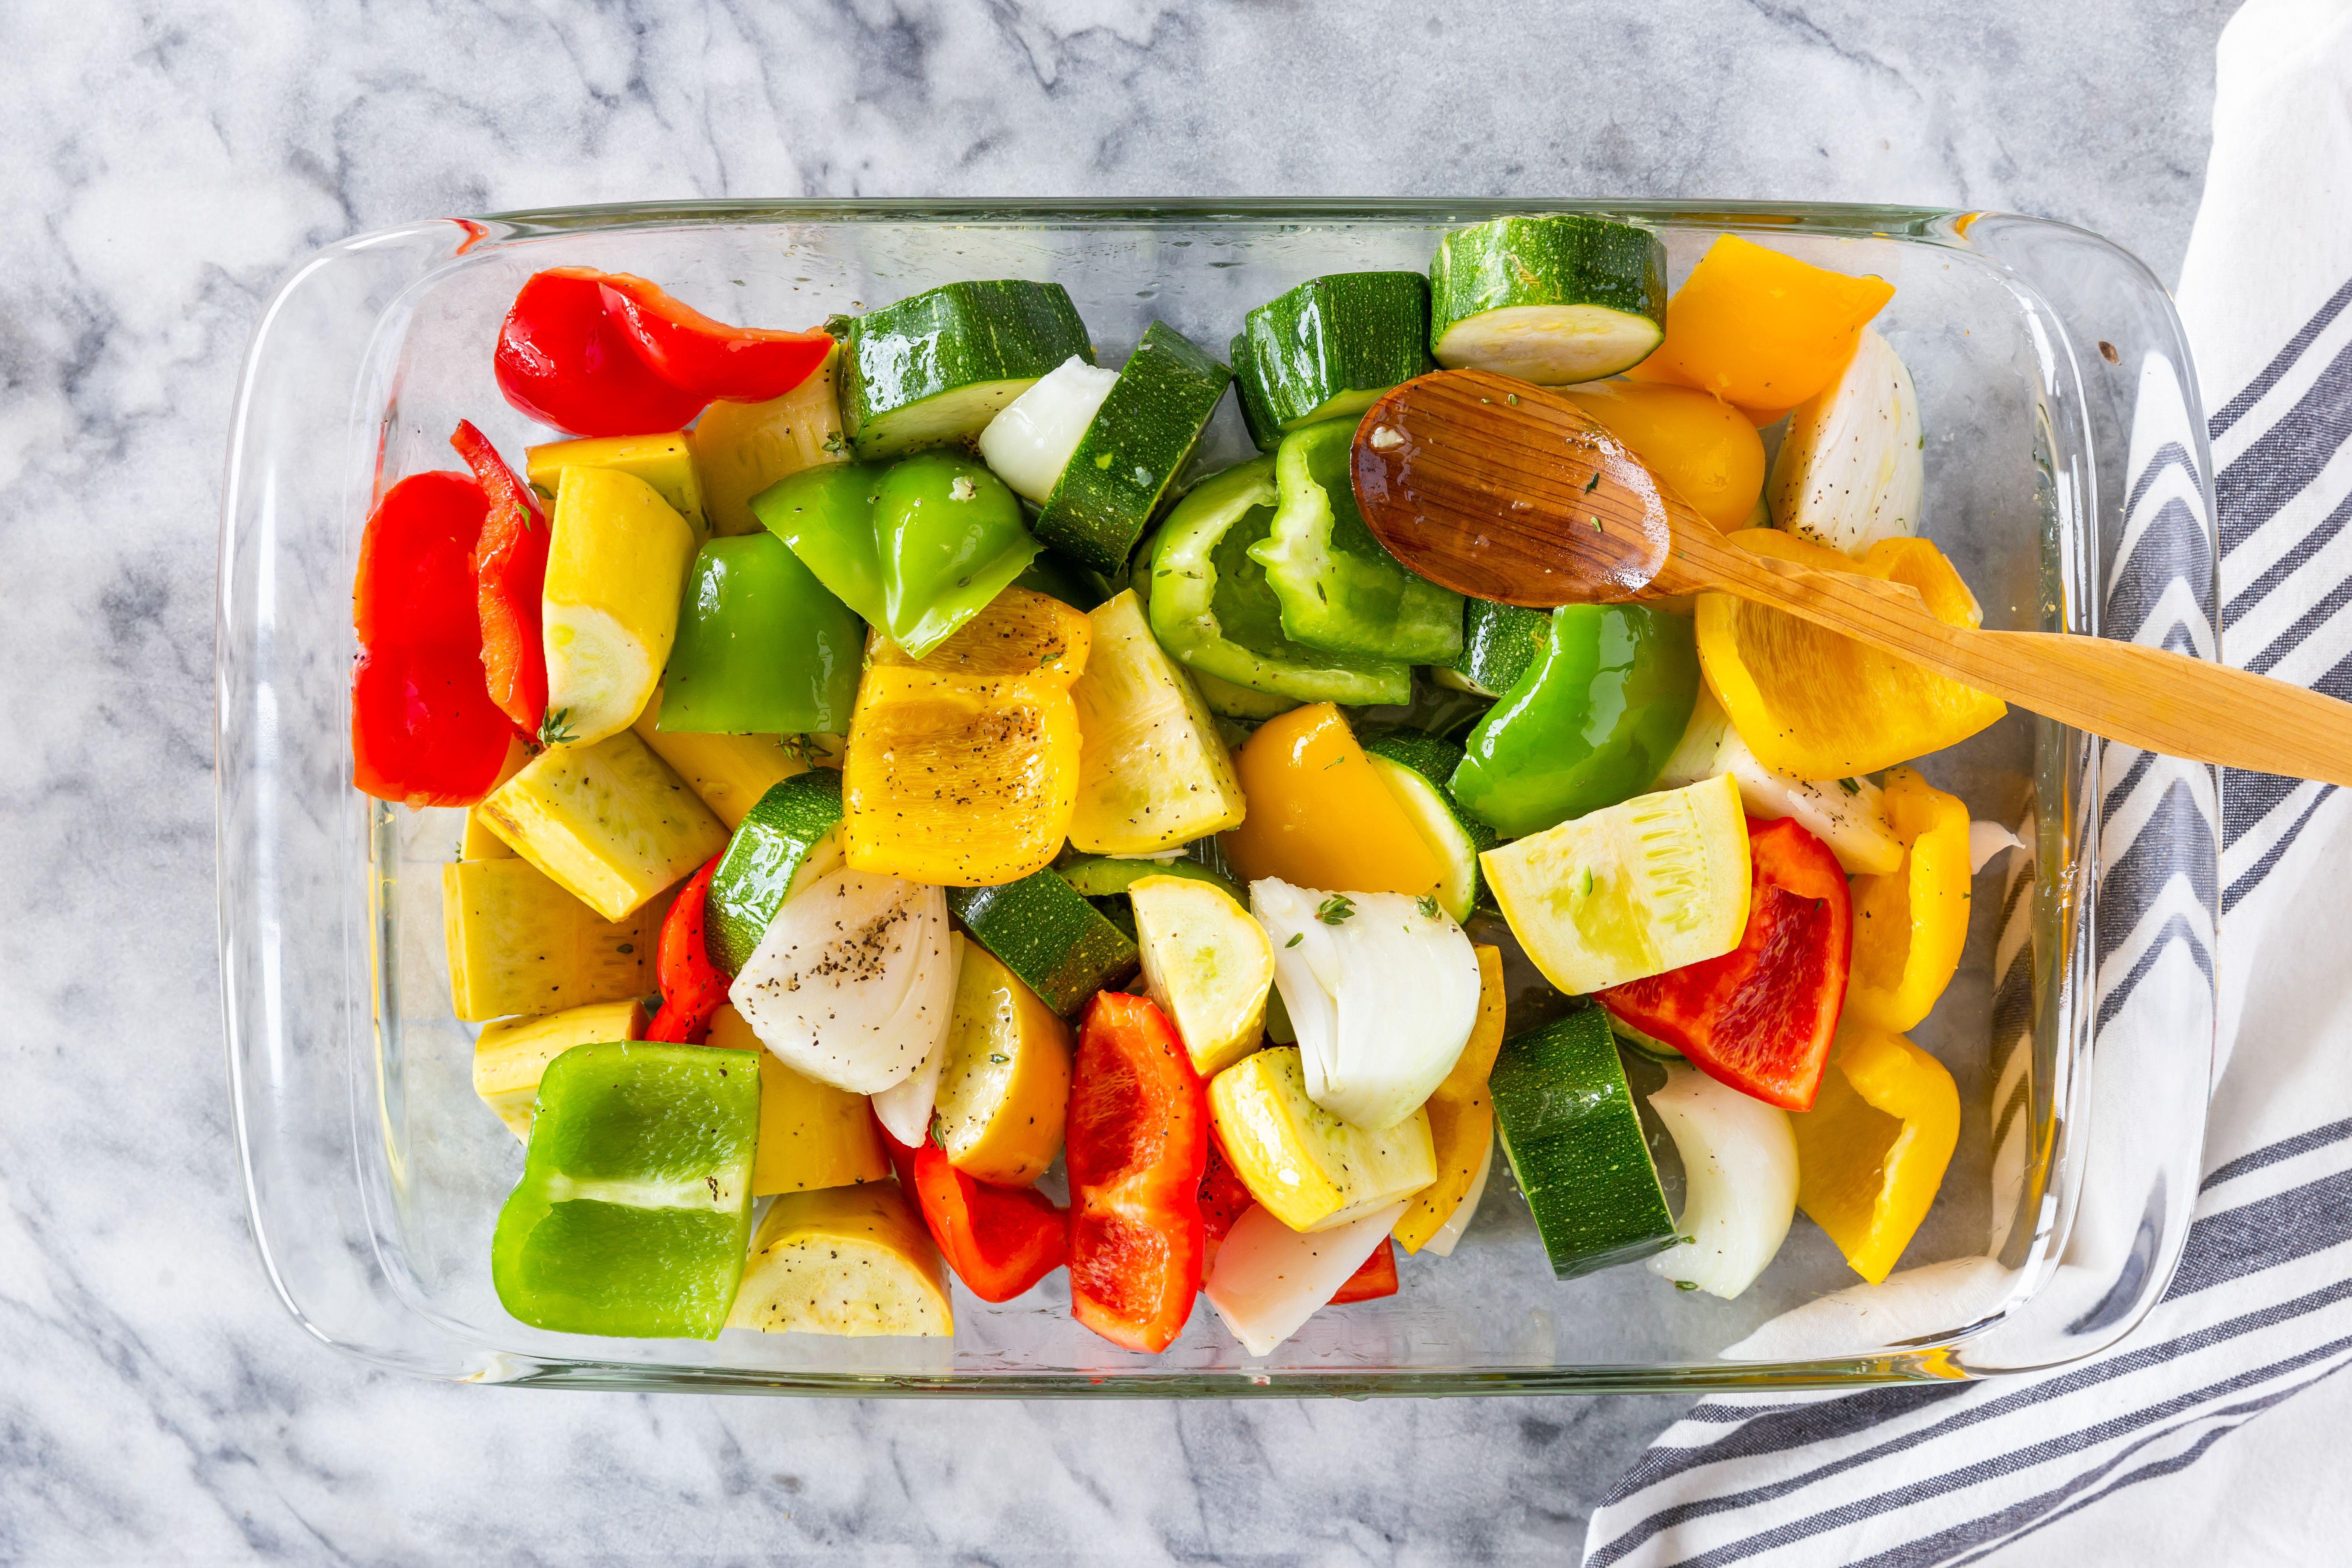 Vegetables in baking dish